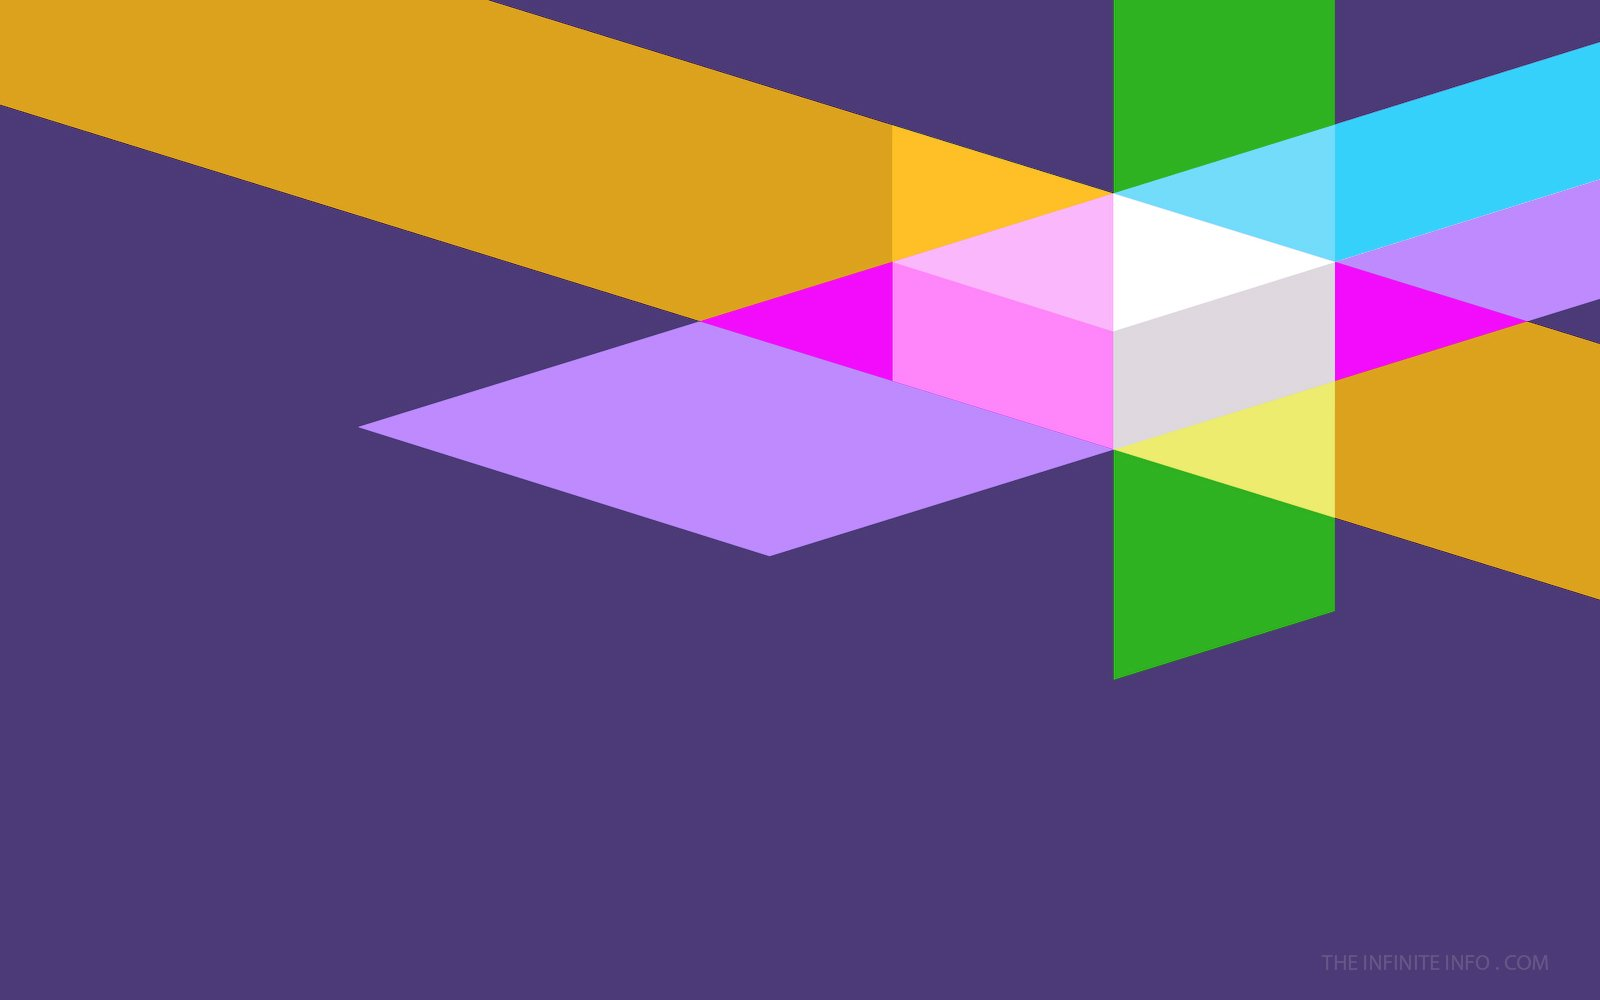 Windows 10 wallpaper official wallpapersafari for Window design hd image